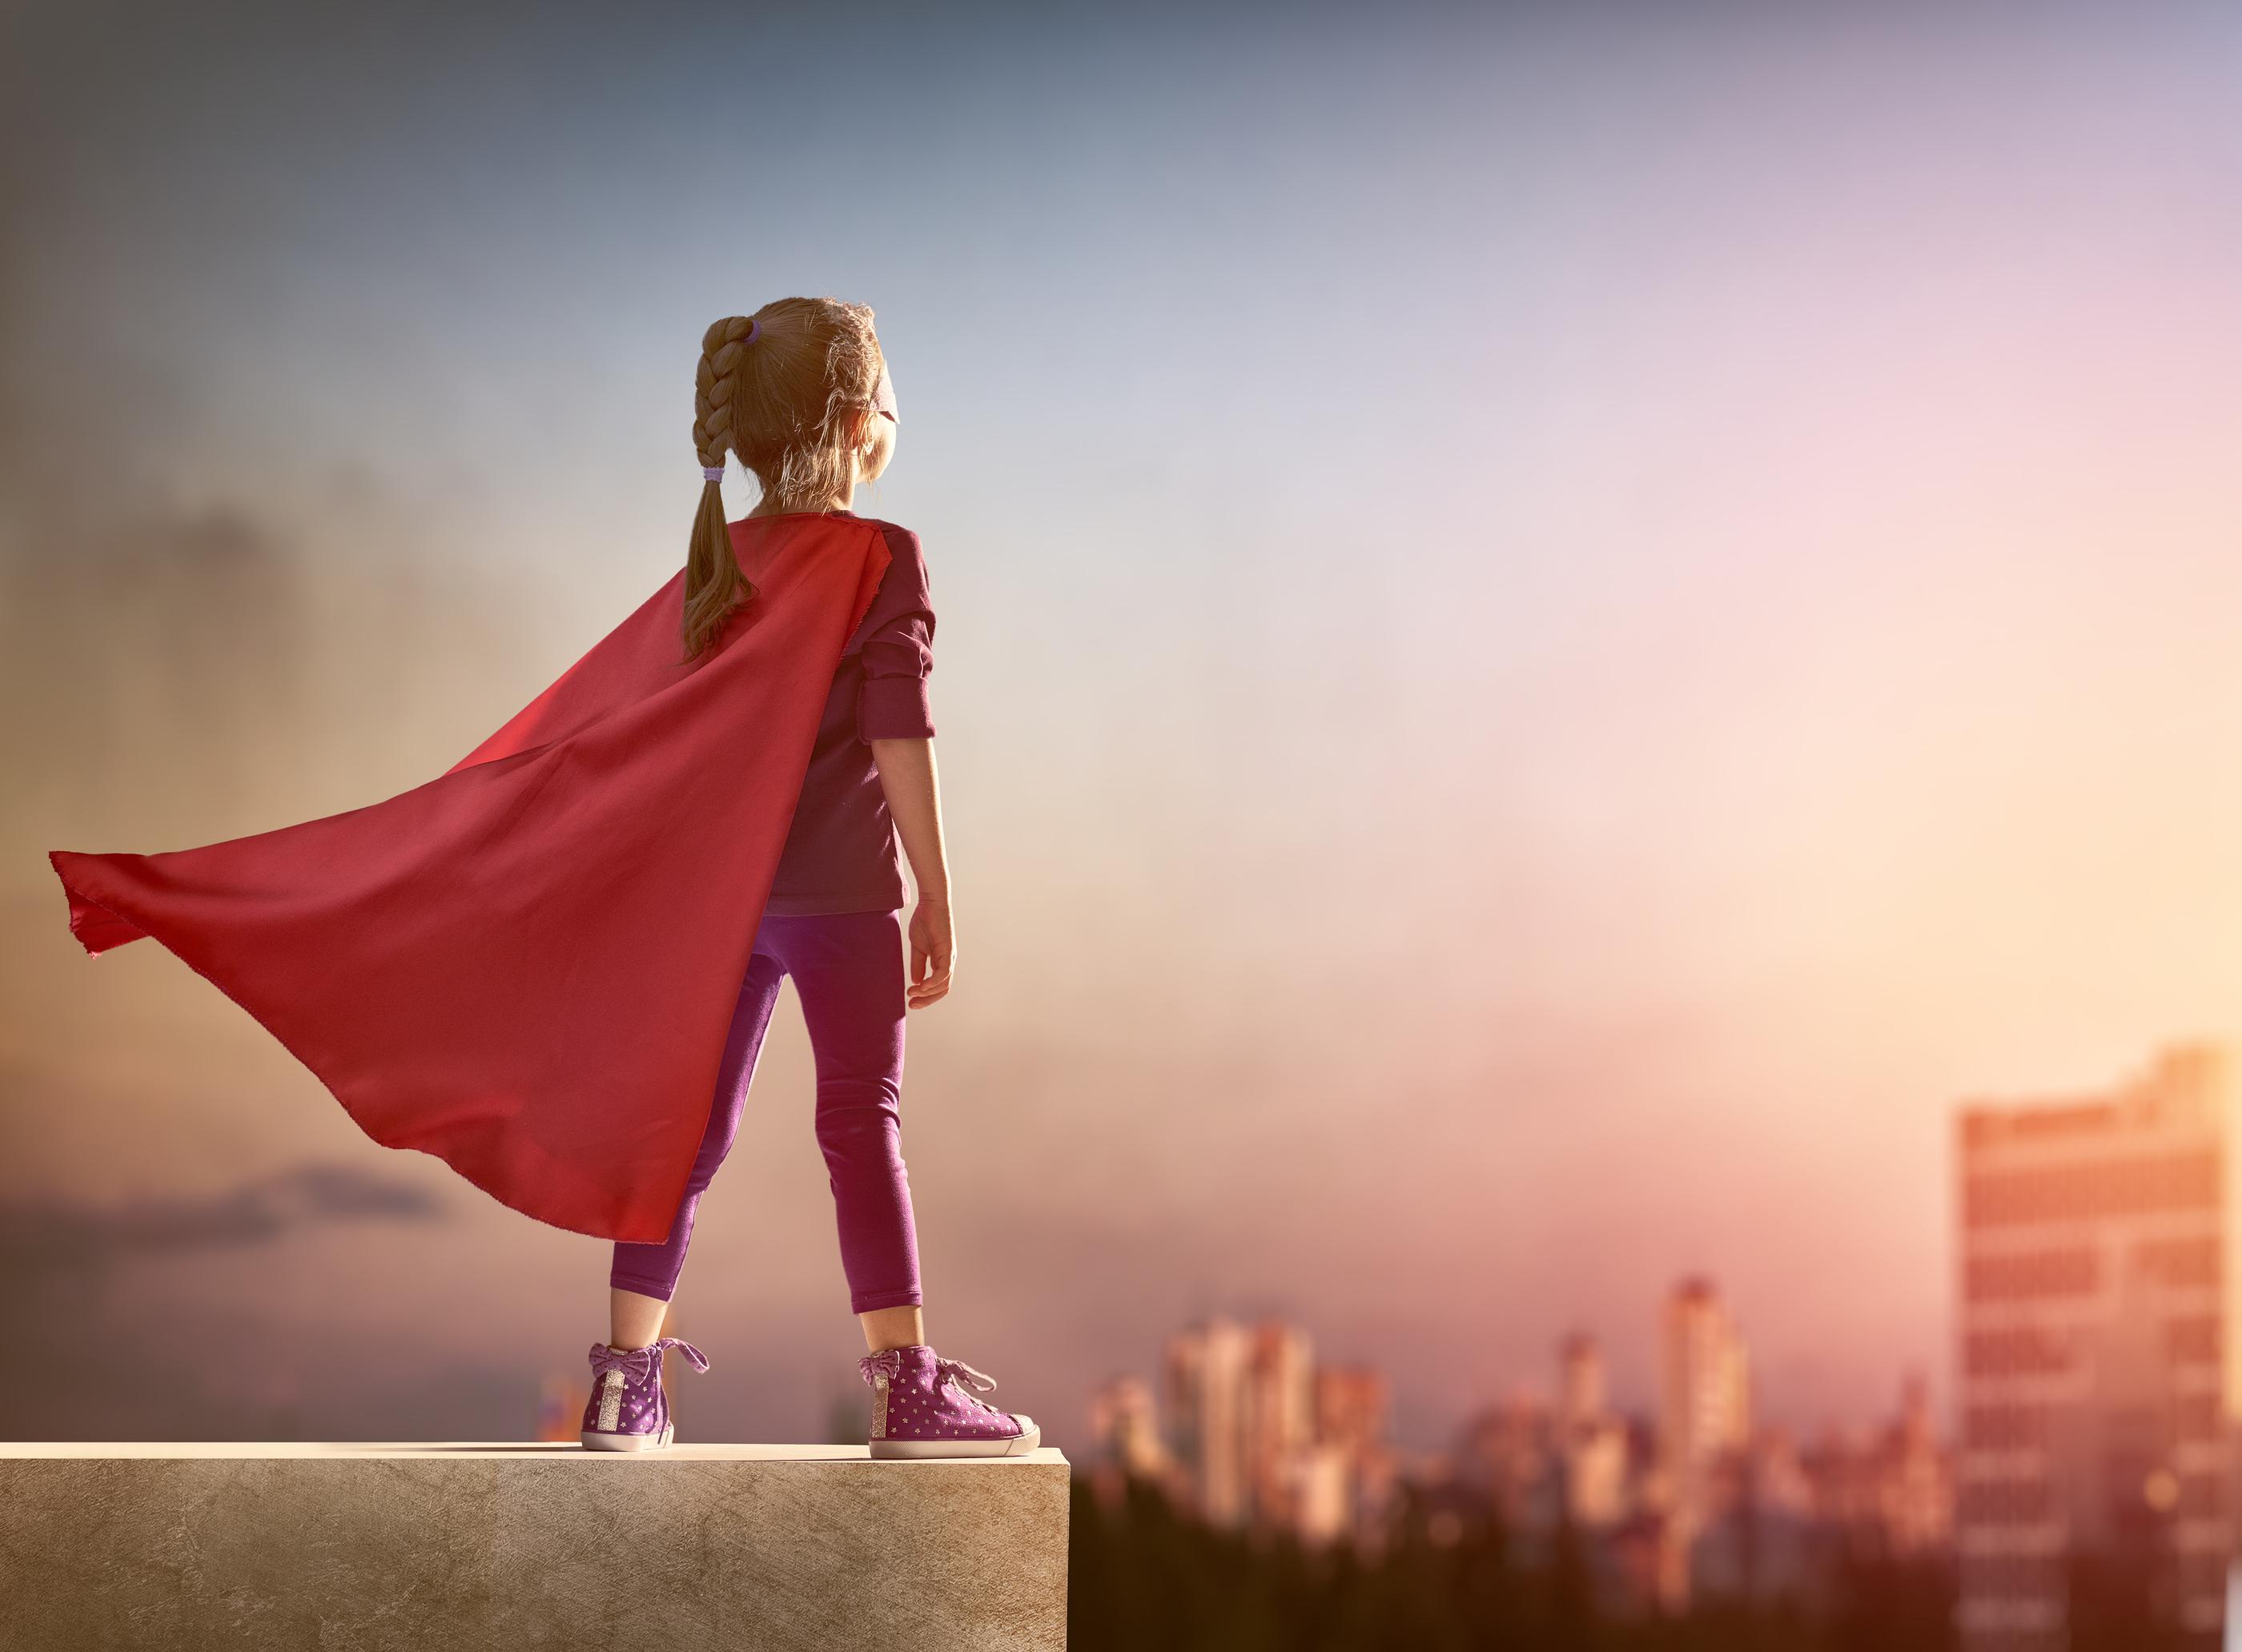 Little child girl plays superhero